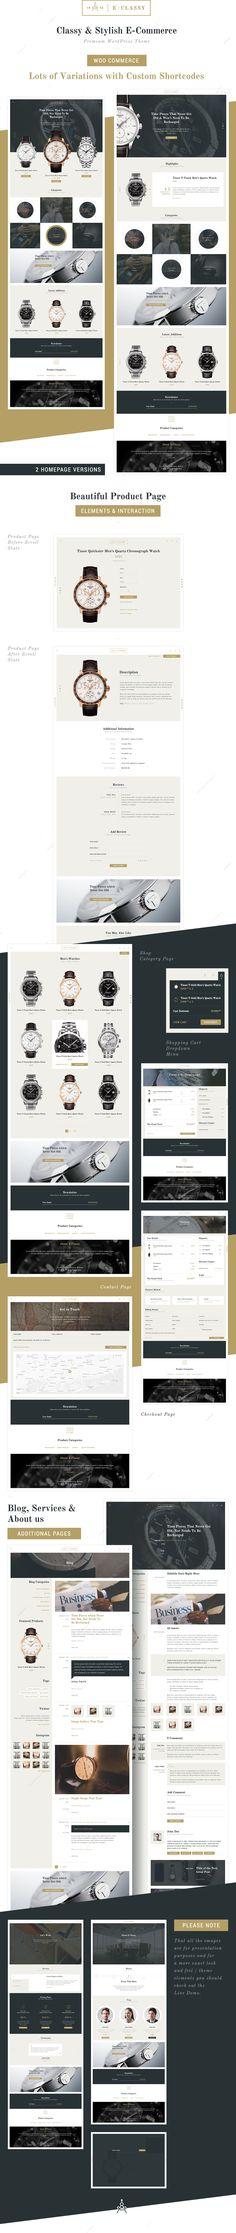 741a79a93 eClassy - eCommerce Classy Pro WordPress Theme #Classy, #eCommerce,  #eClassy,